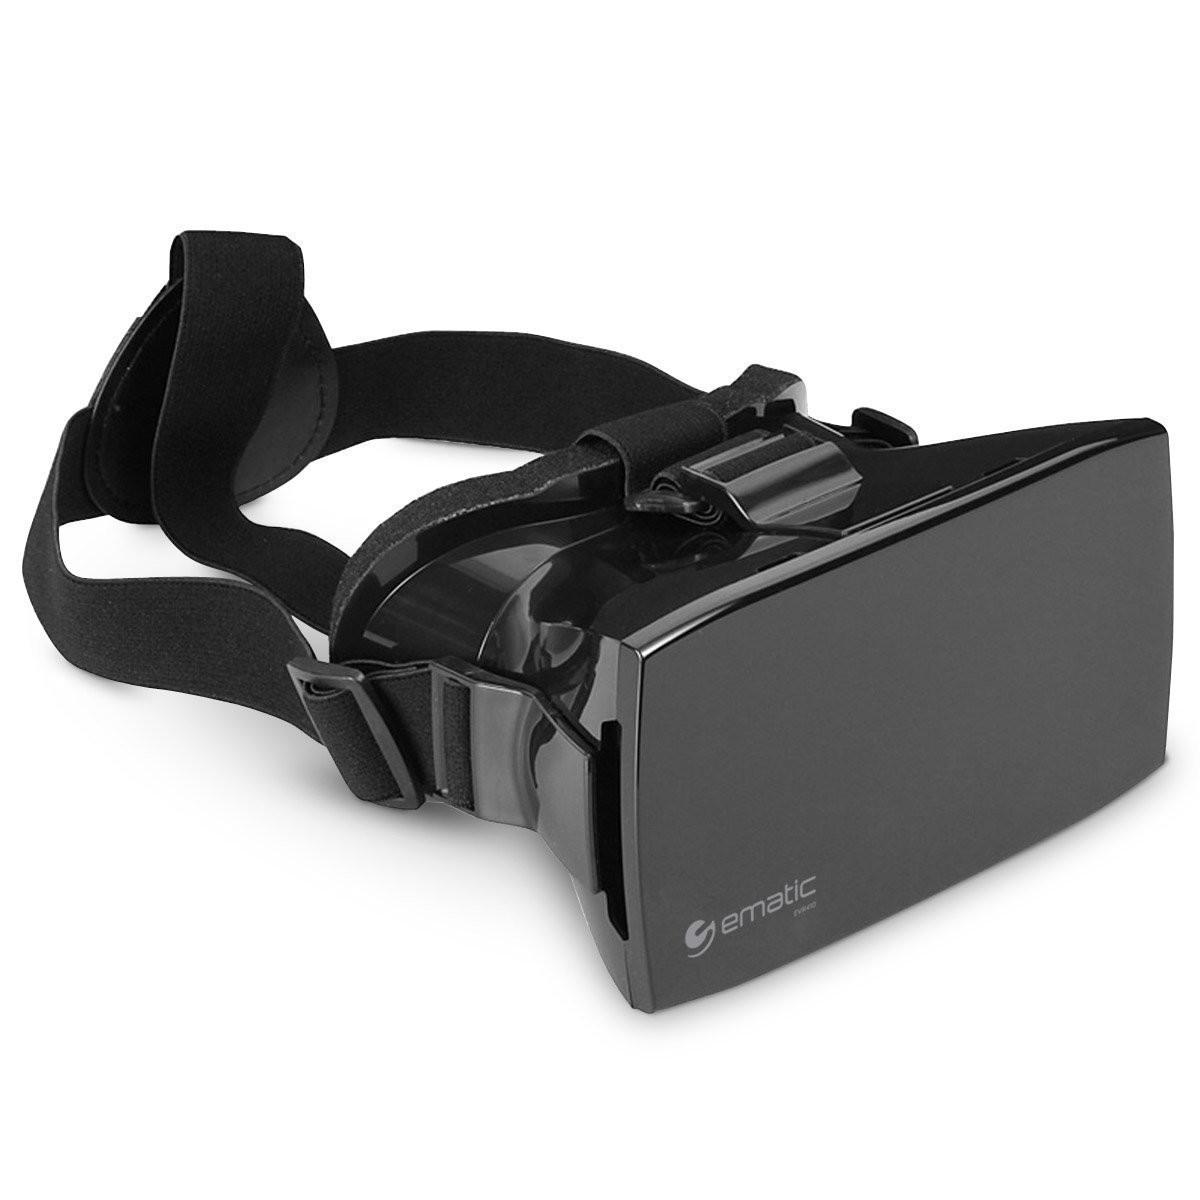 HEADSET REALIDAD VIRTUAL 3D EMATIC EVR410 COMPATIBLE ANDROIDE IPHONE SOPORTA CELULARES 4 HASTA 6 PULGADAS